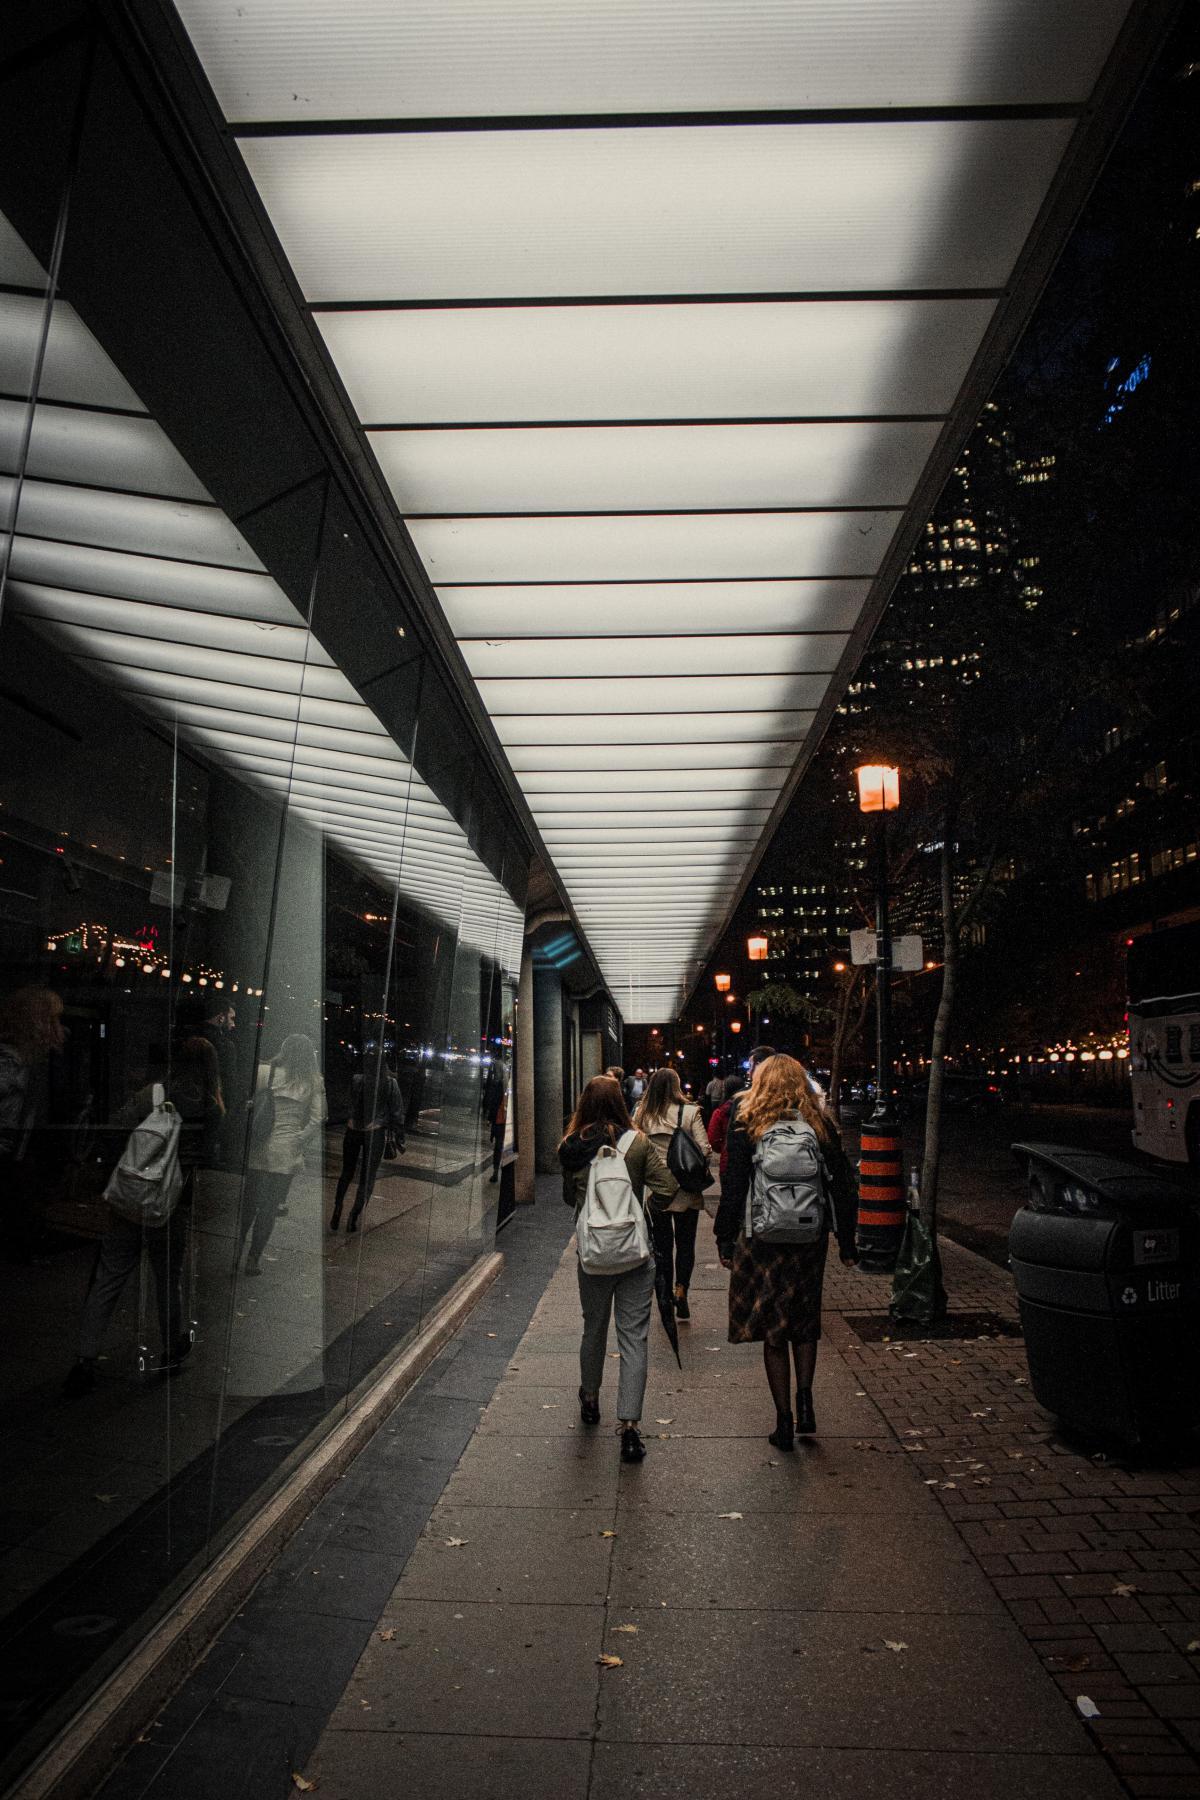 Station Terminal Subway station #426610